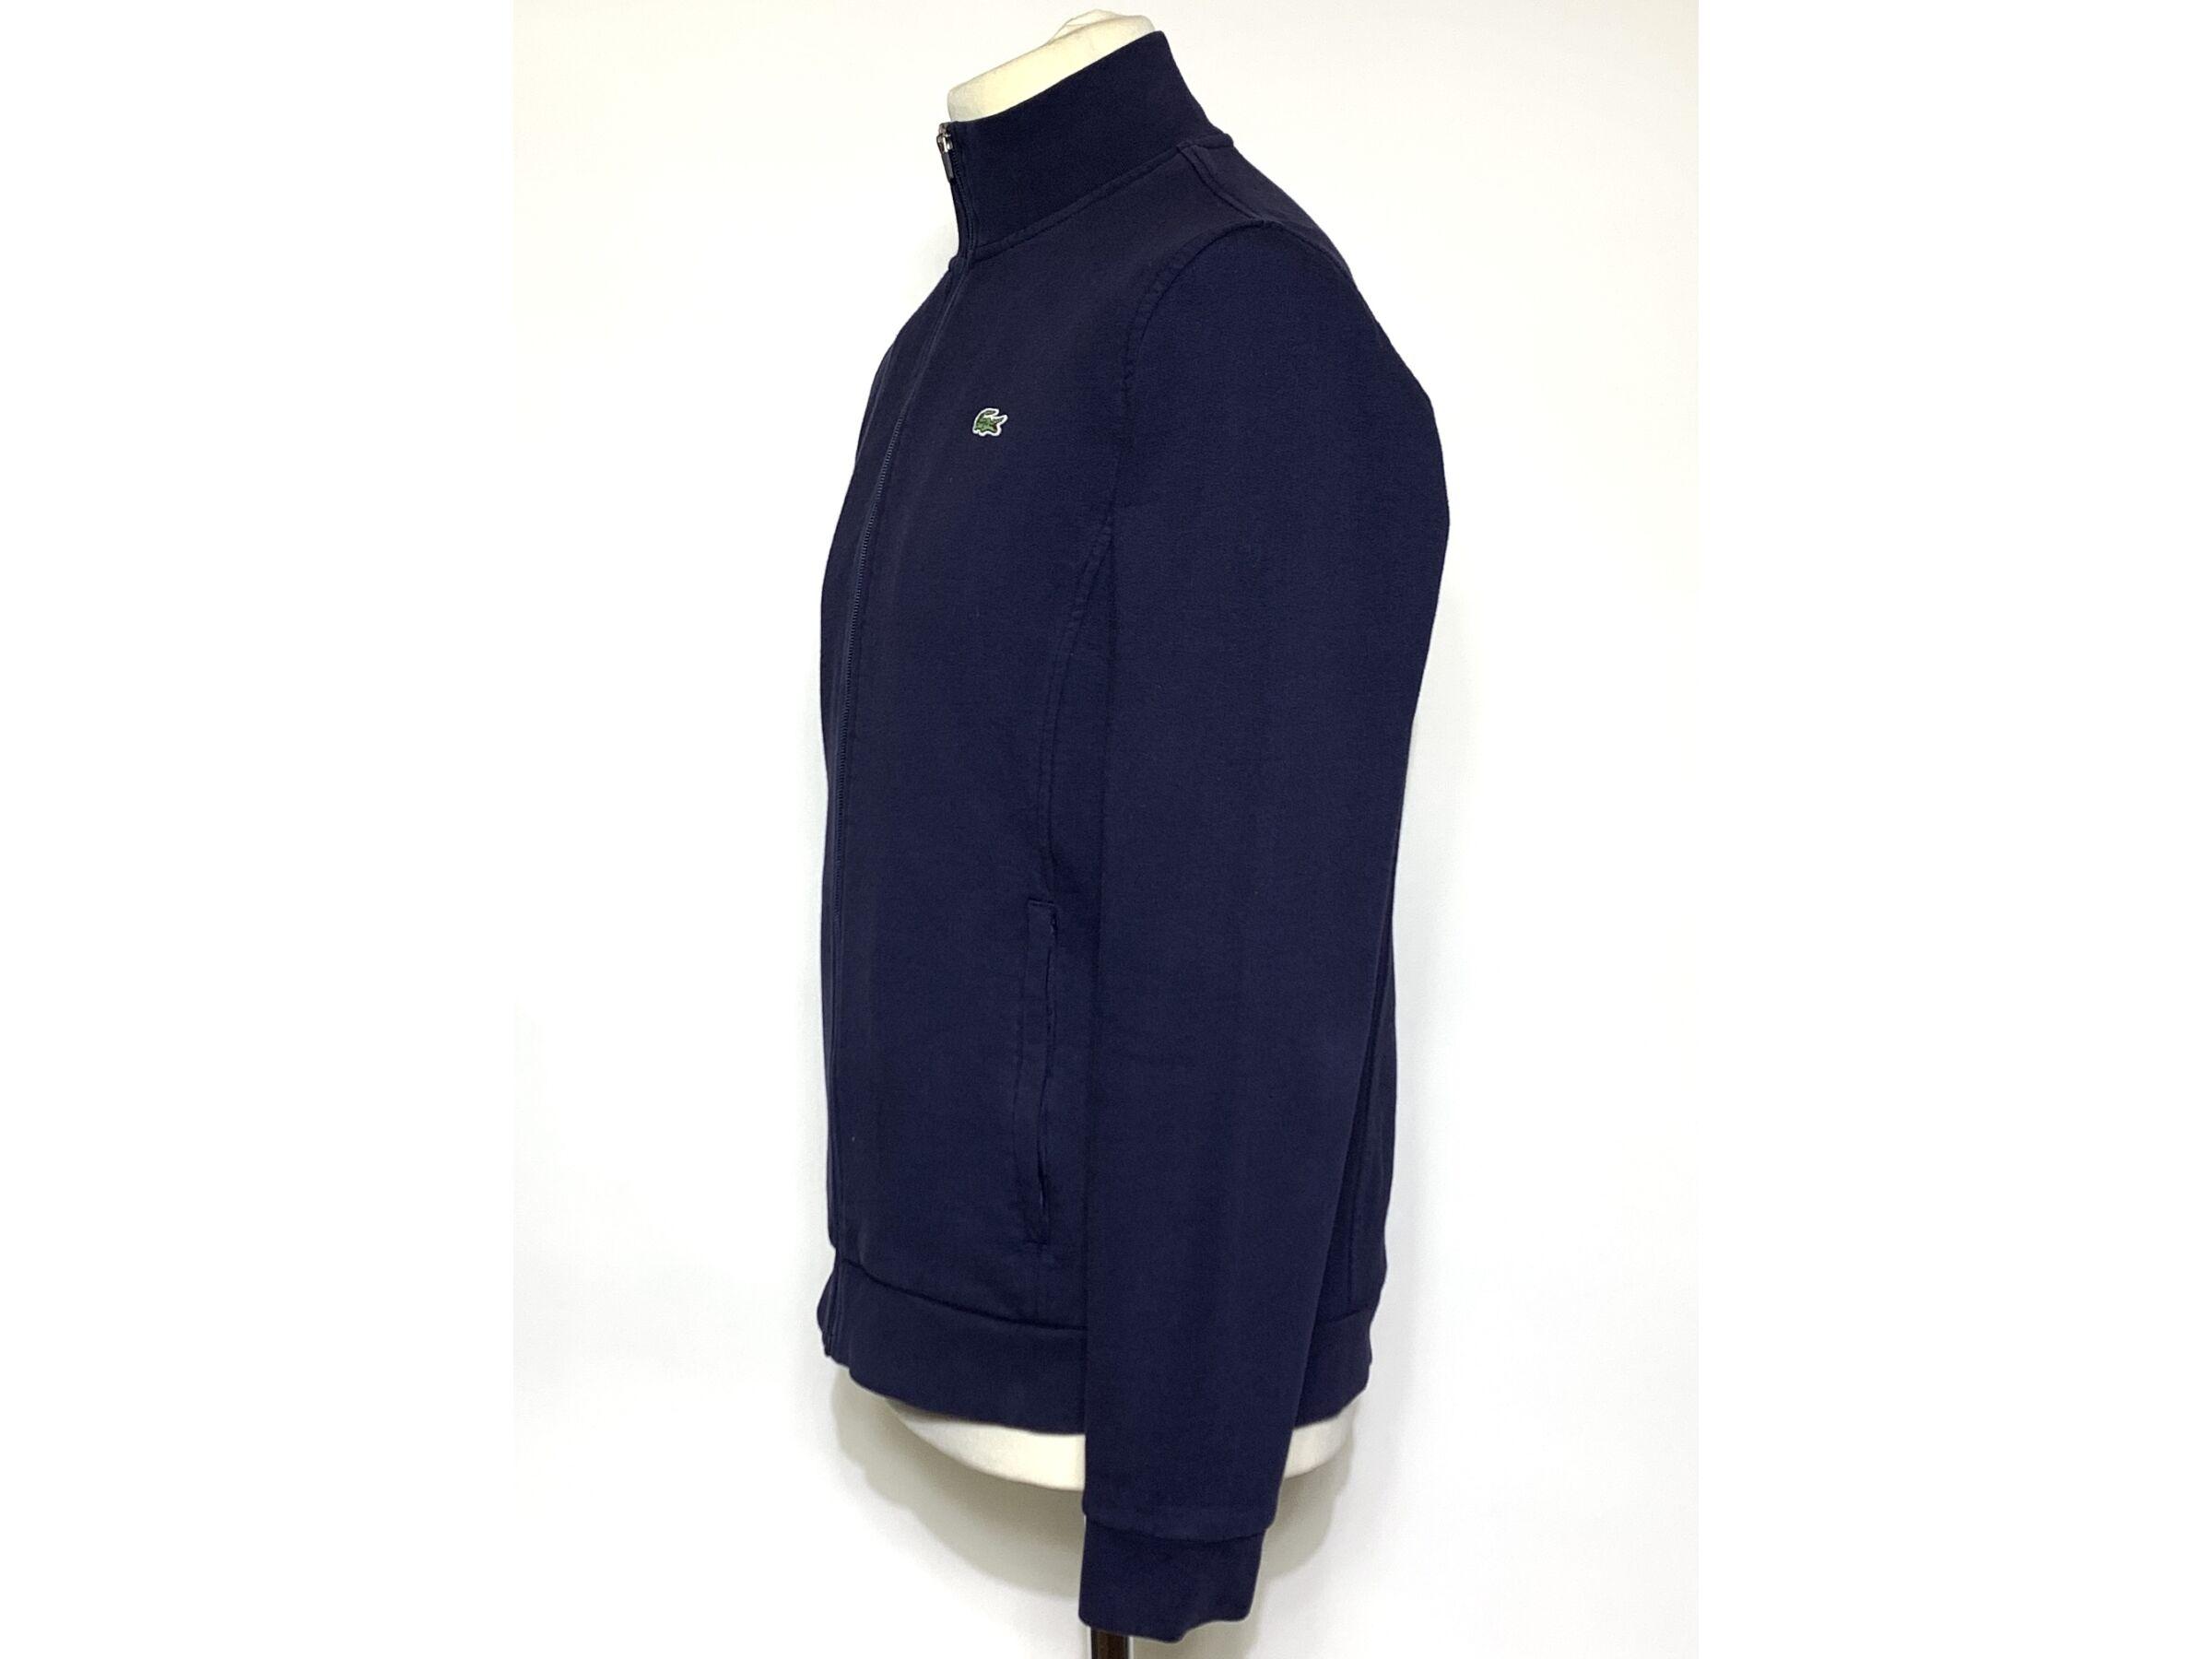 Lacoste pulóver (L)